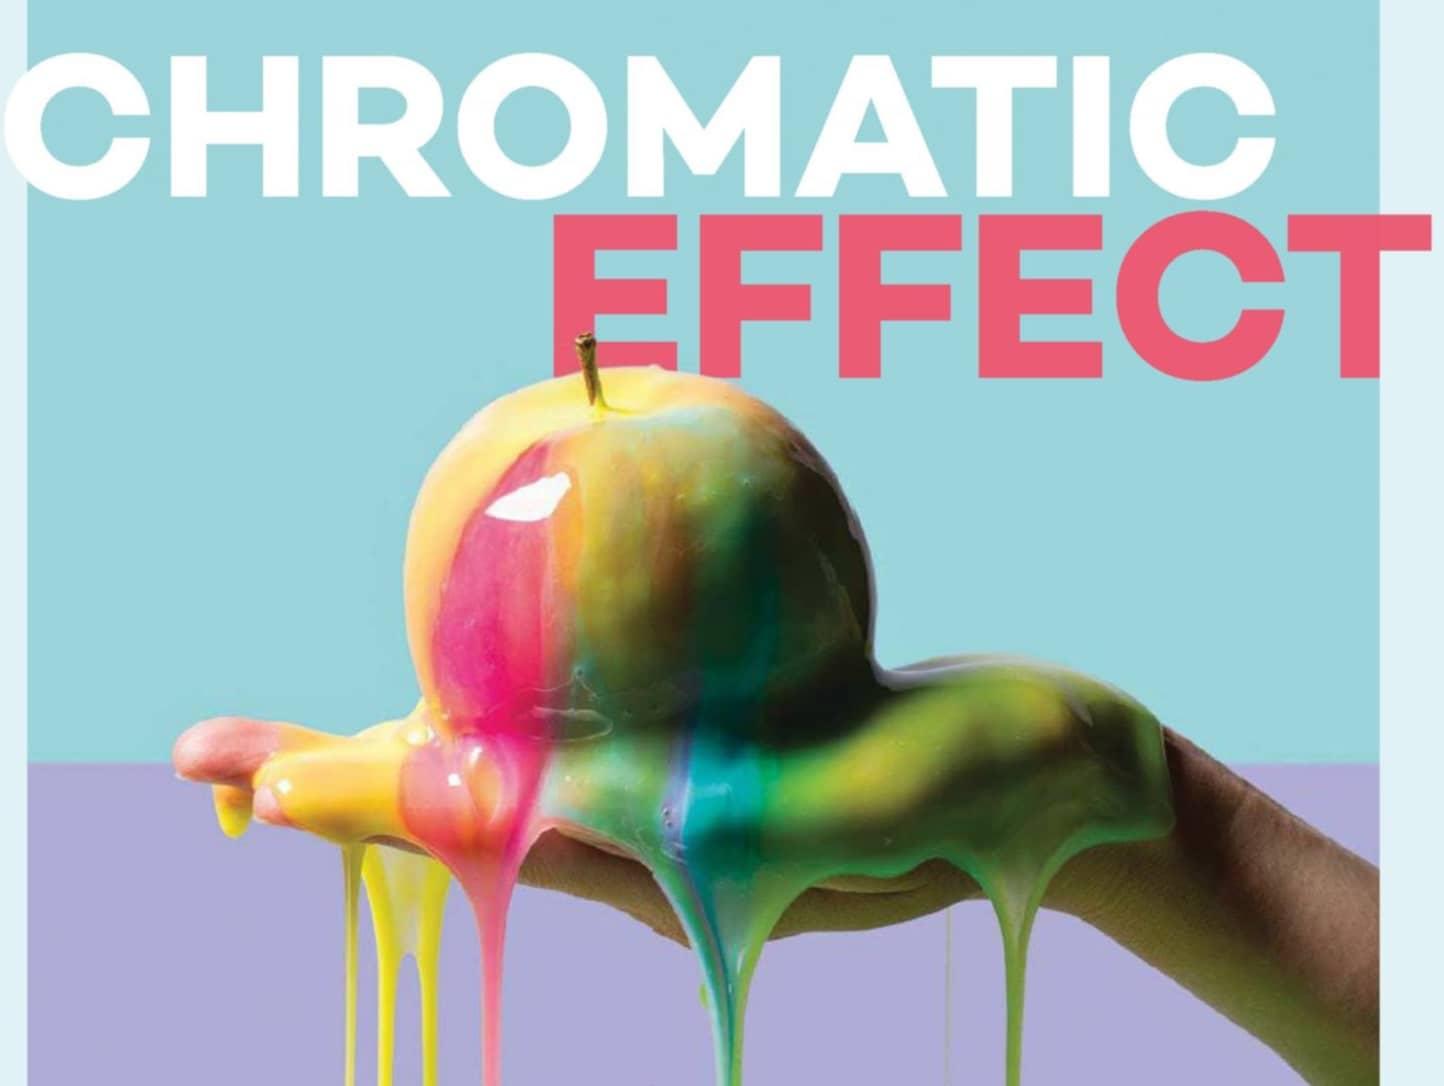 CHROMATIC EFFECT